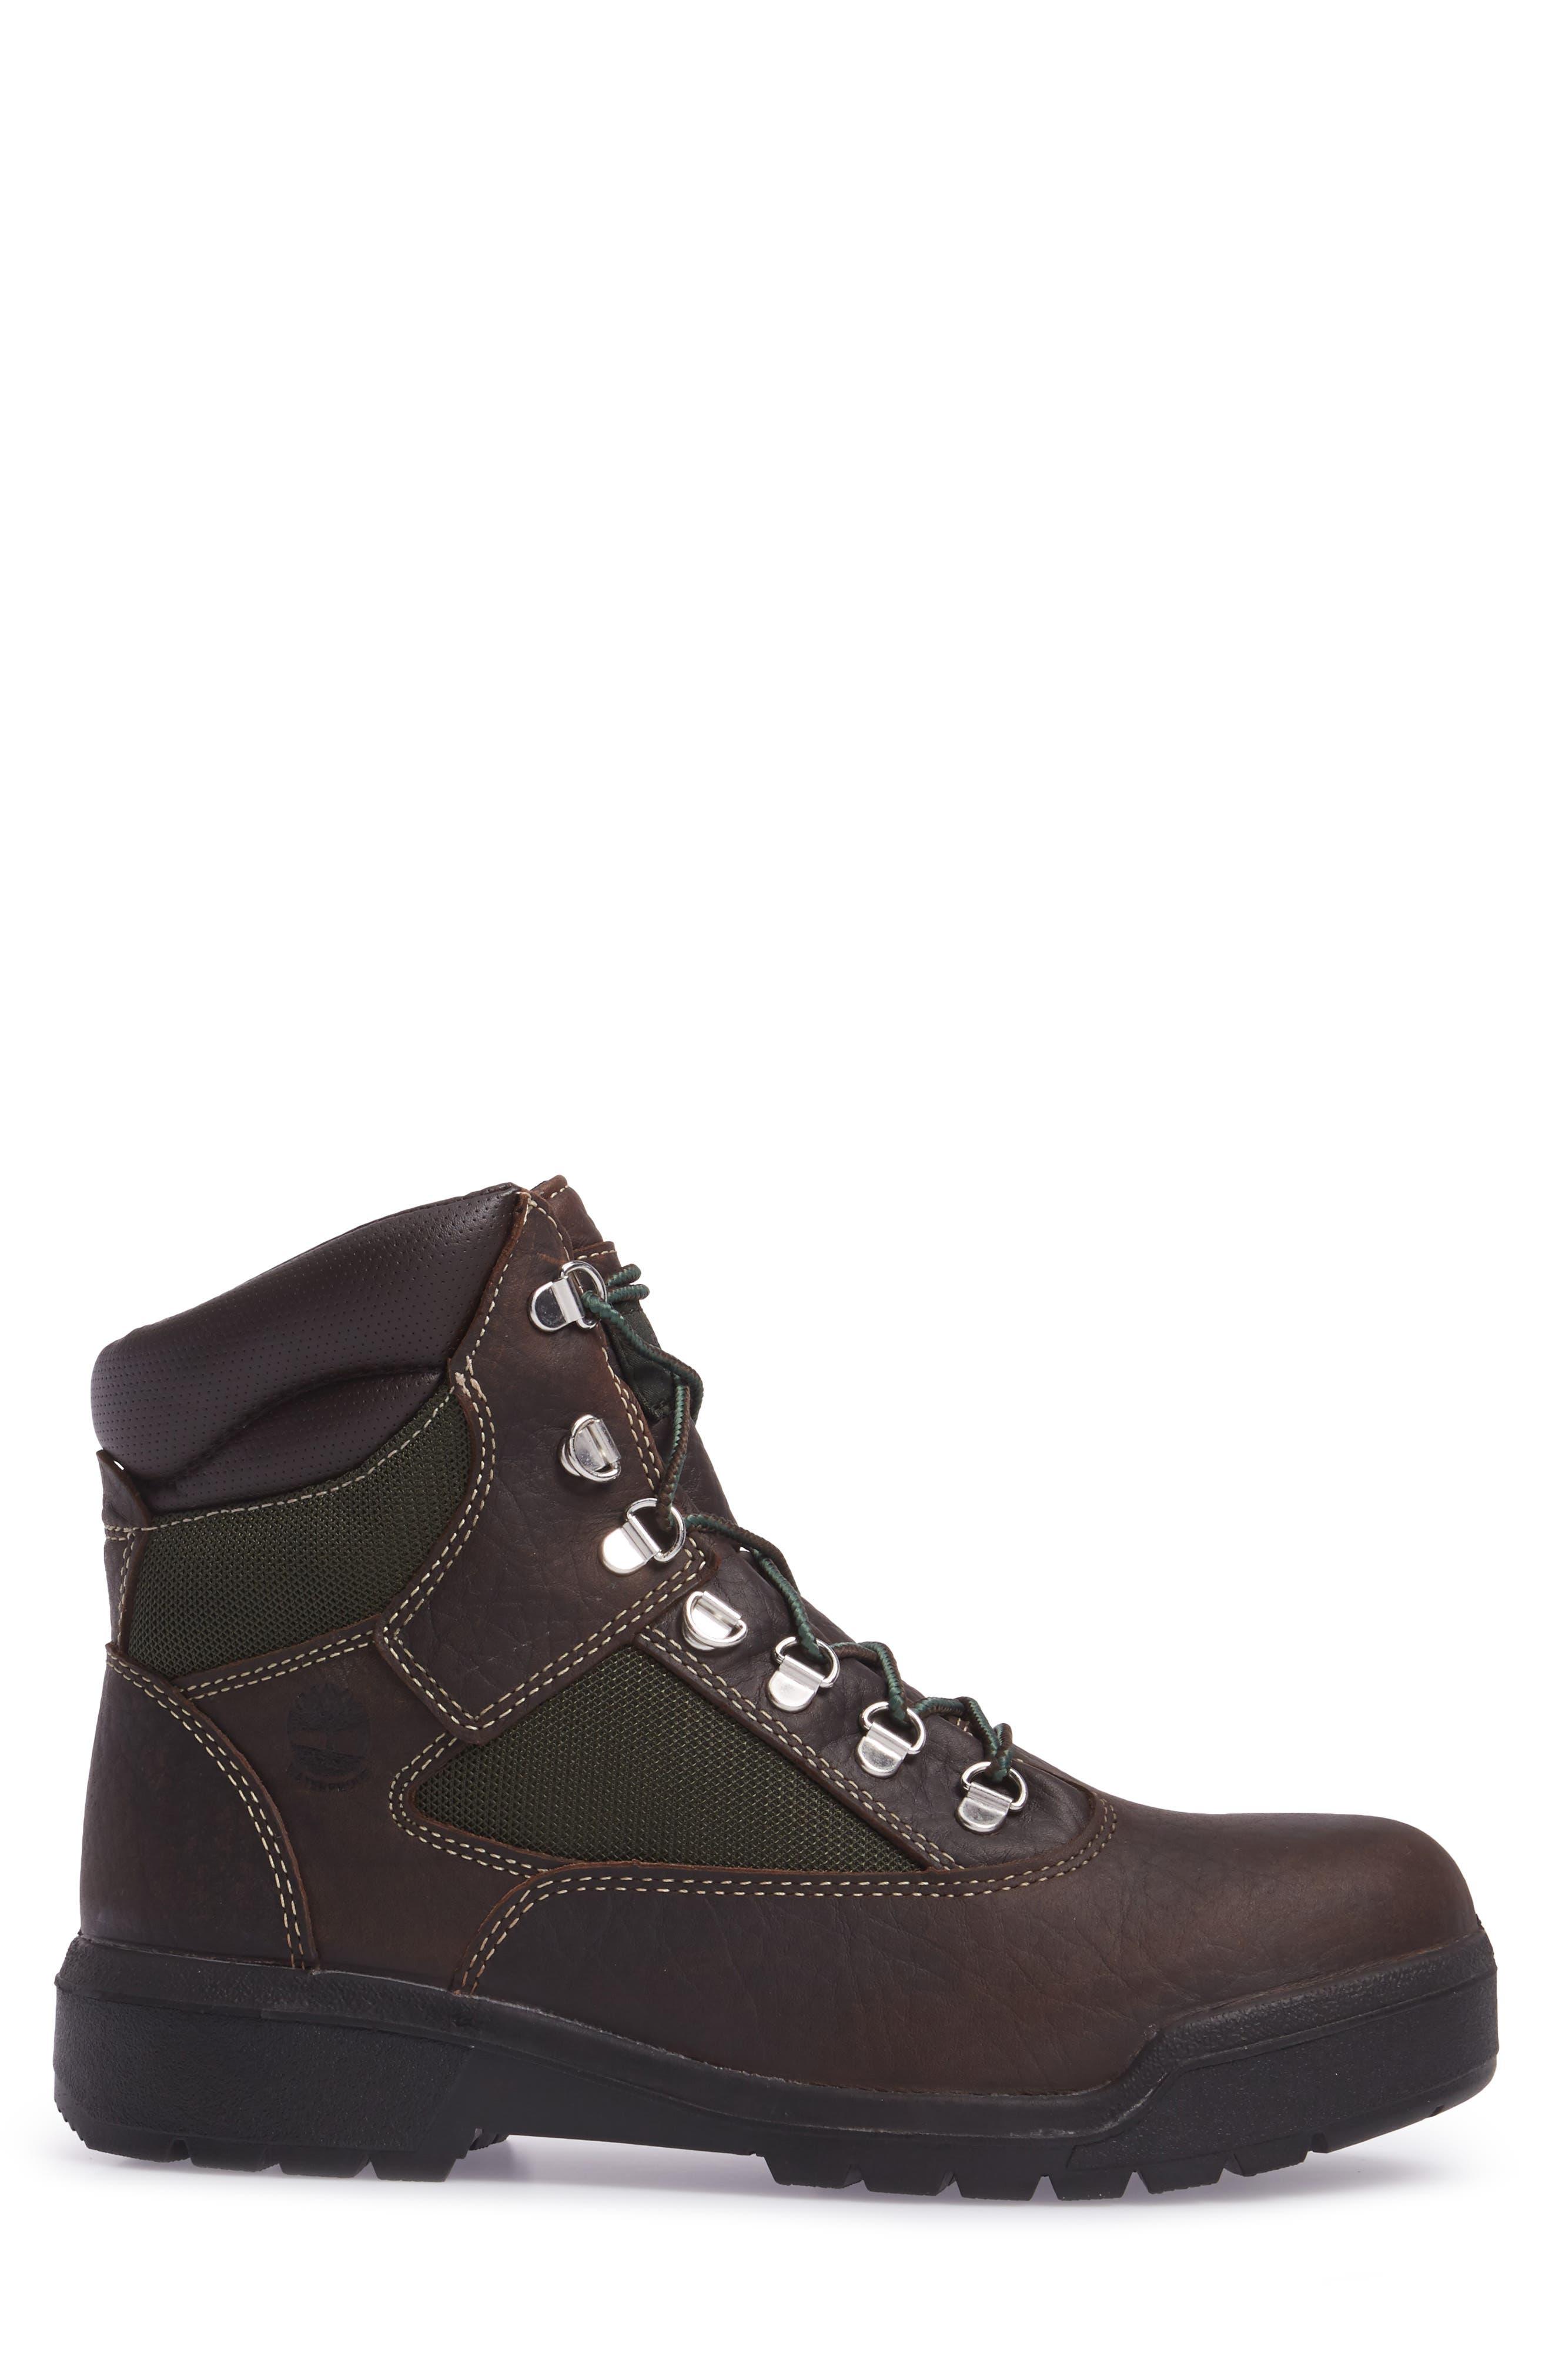 Field Waterproof Winter Boot,                             Alternate thumbnail 3, color,                             Hazel Highway Leather